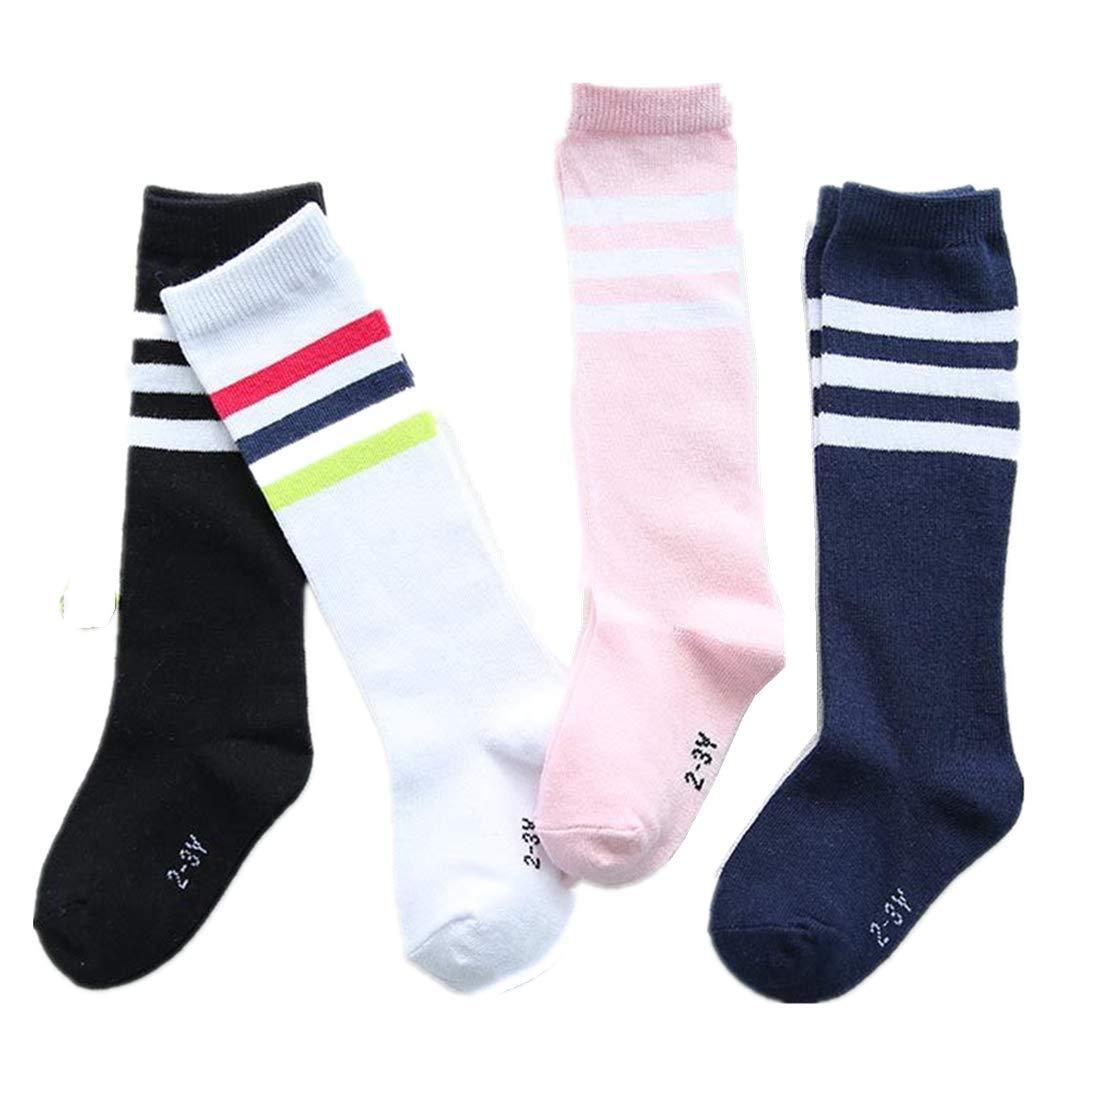 Natuworld Pack of 4 Children Girls Boys Toddlers Cotton Thicken Knee Long Soccer Socks Team Socks for 4-5 Years Old Kids(diffrent color) by Natuworld